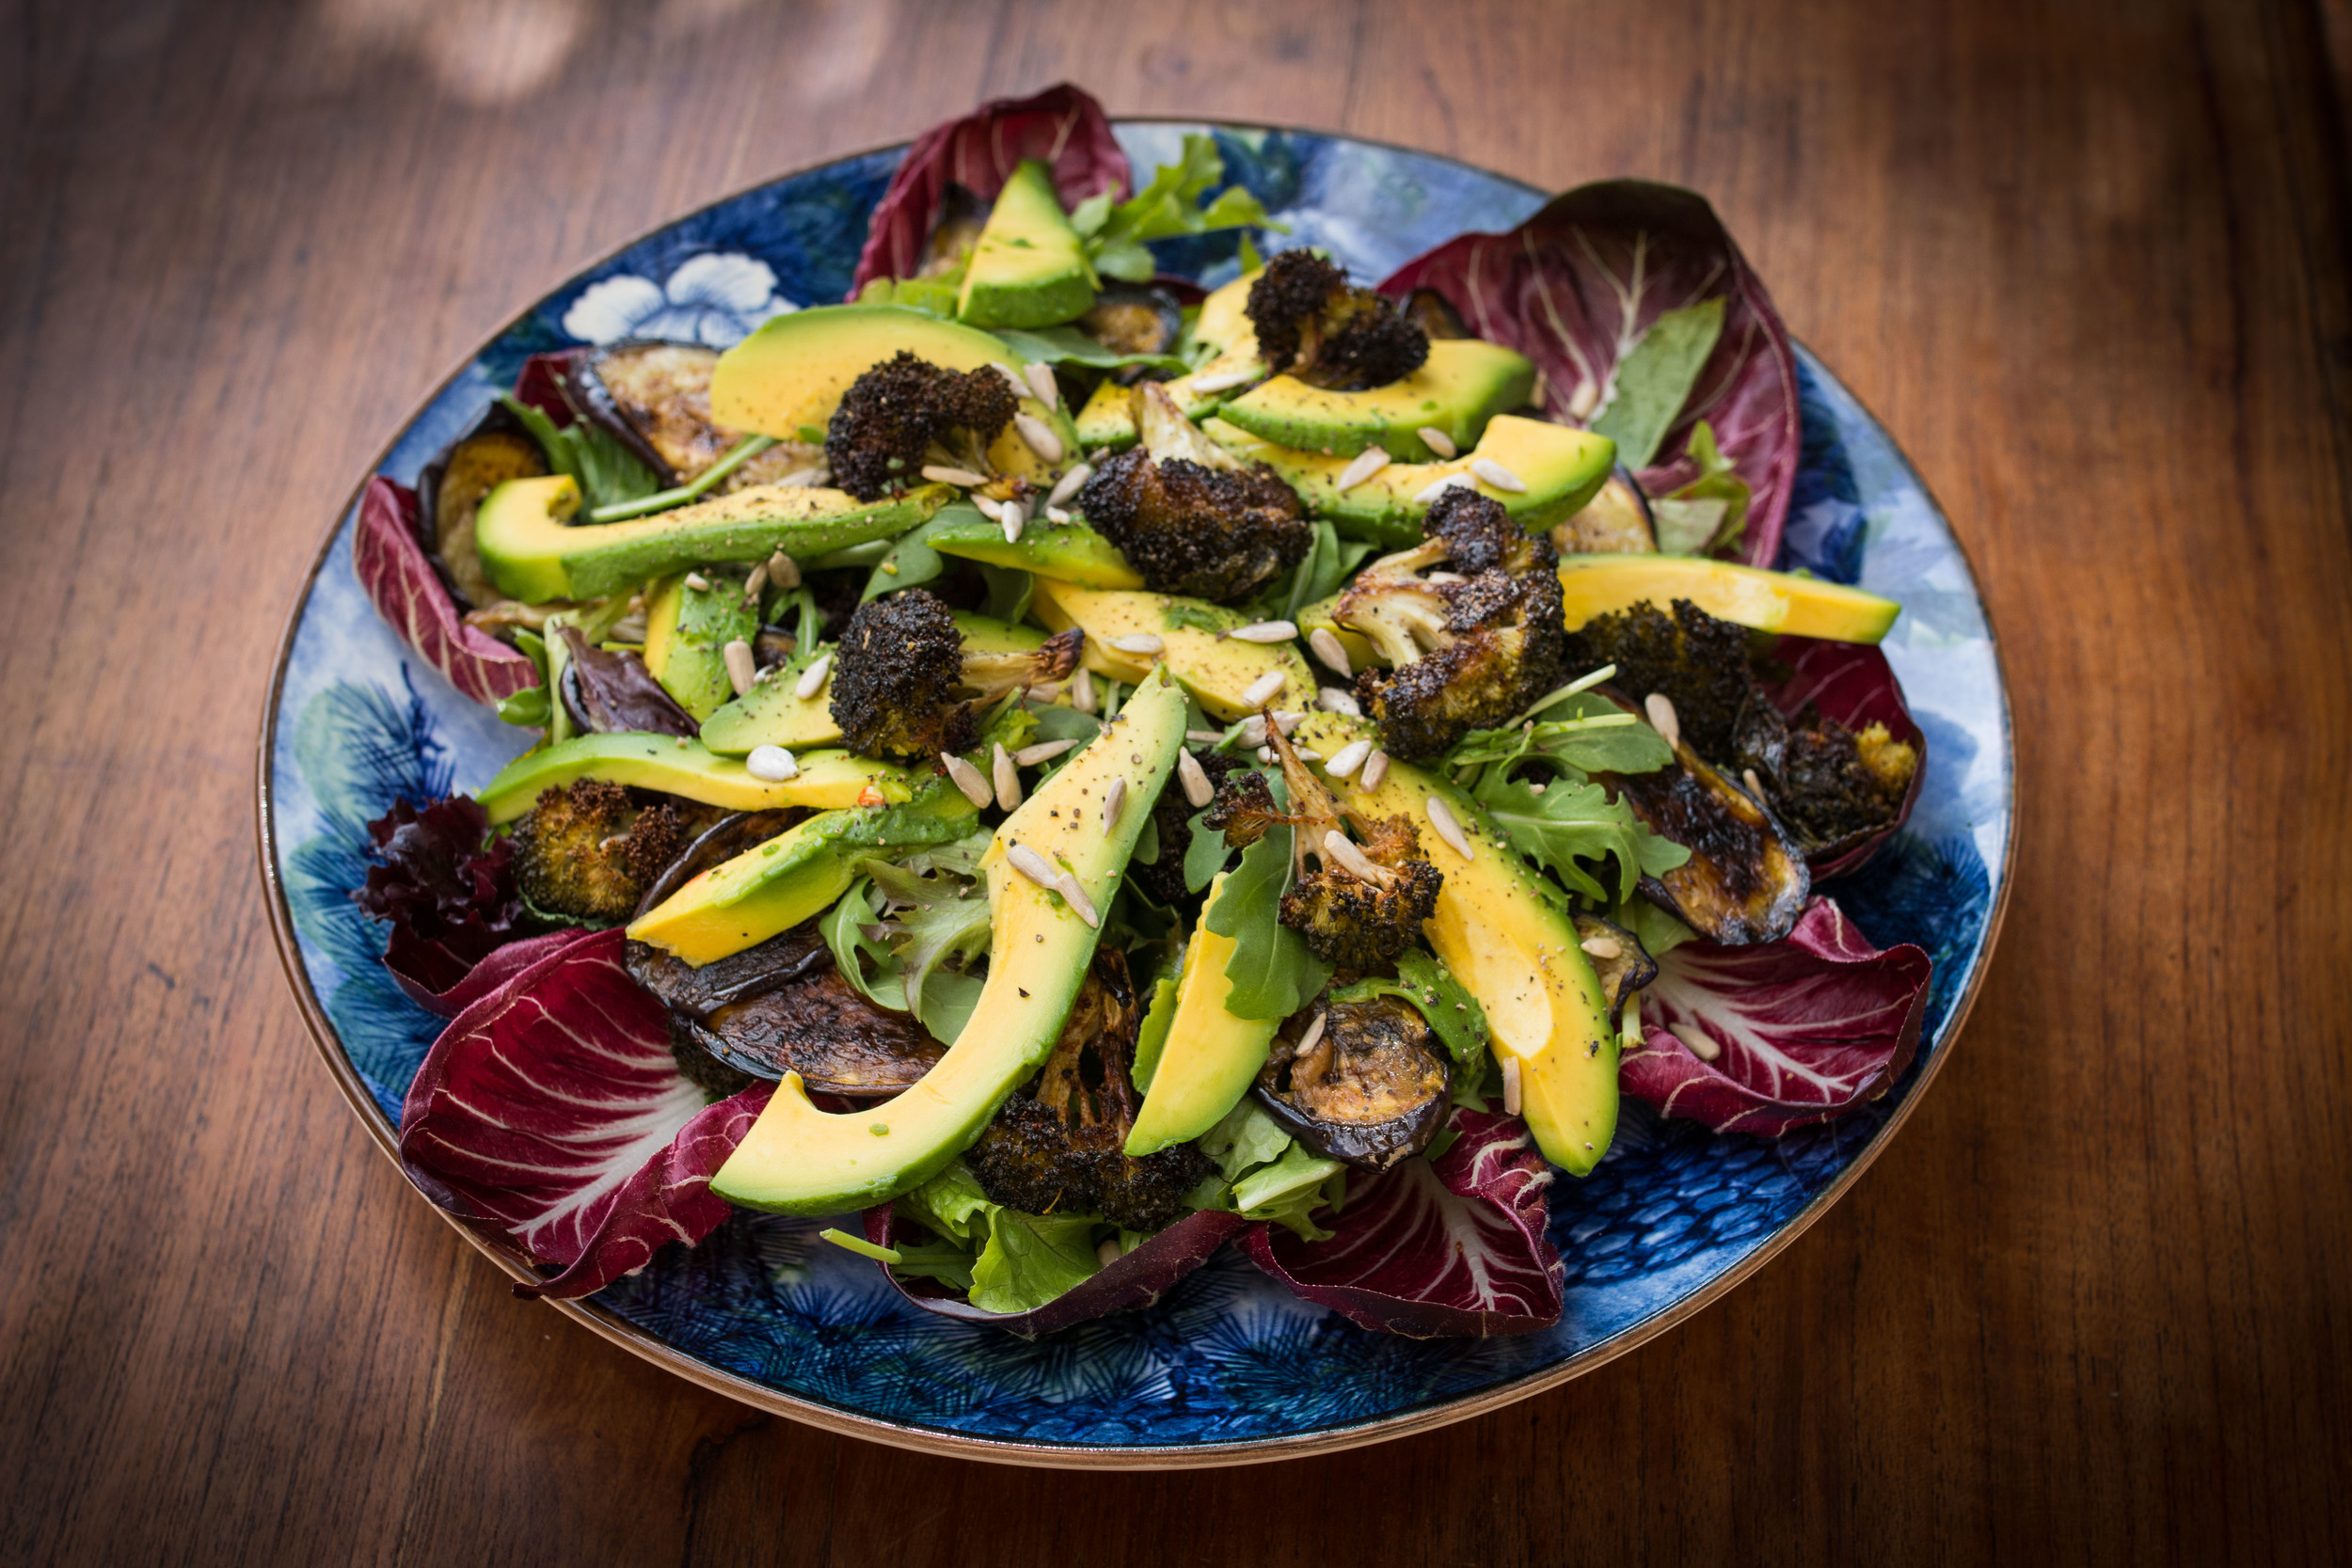 Roasted Broccoli and Eggplant Avocado Salad